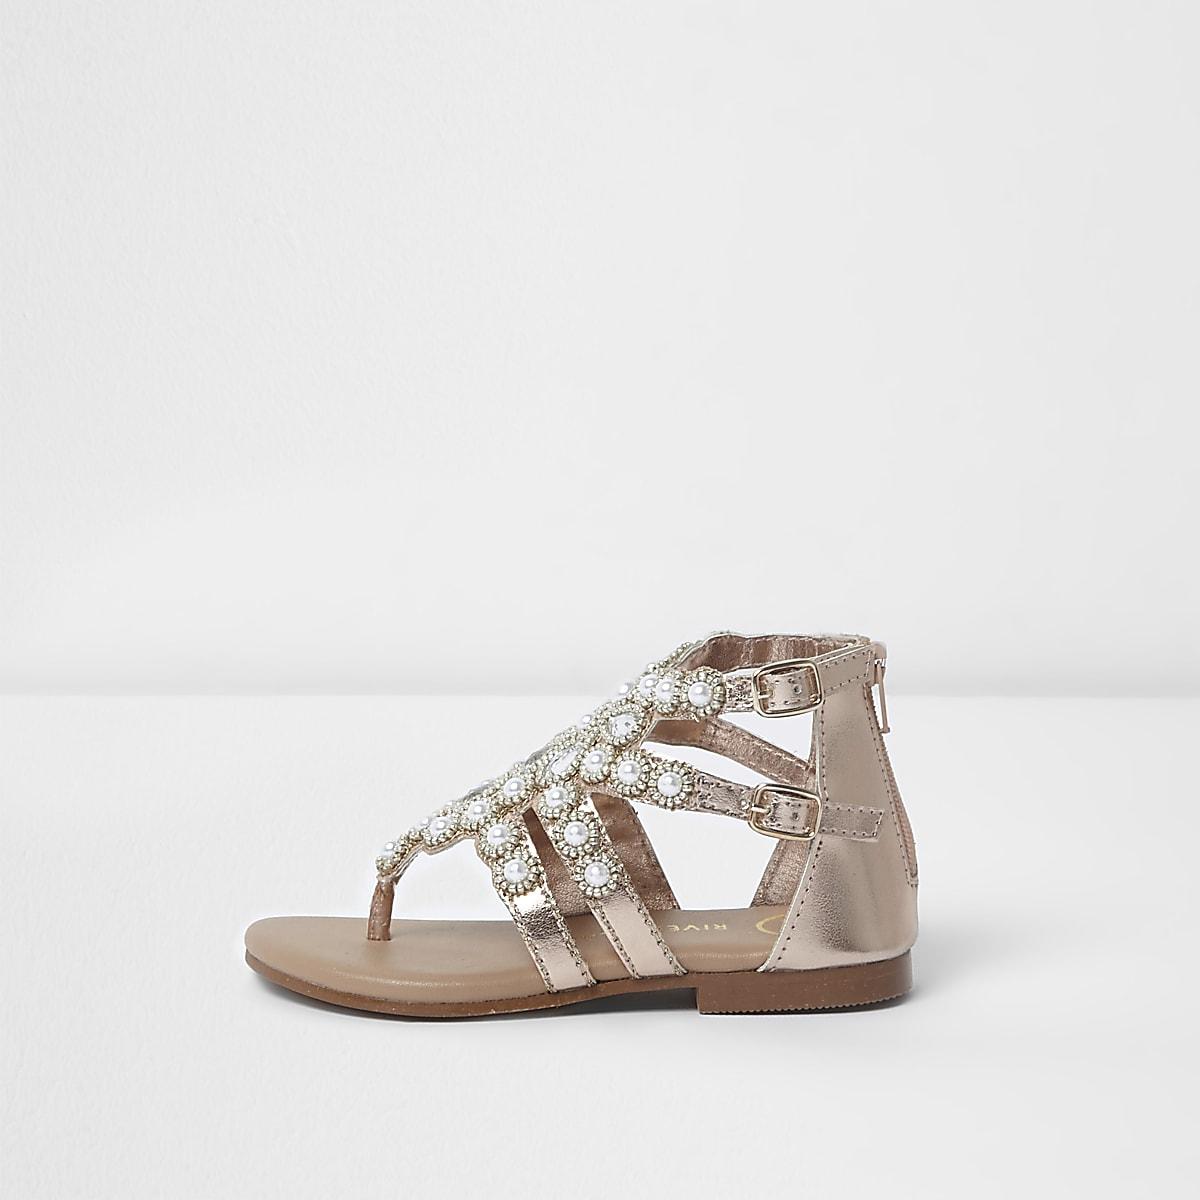 online store df7cd cb4cd Mini girls gold jewel toe post cage sandals